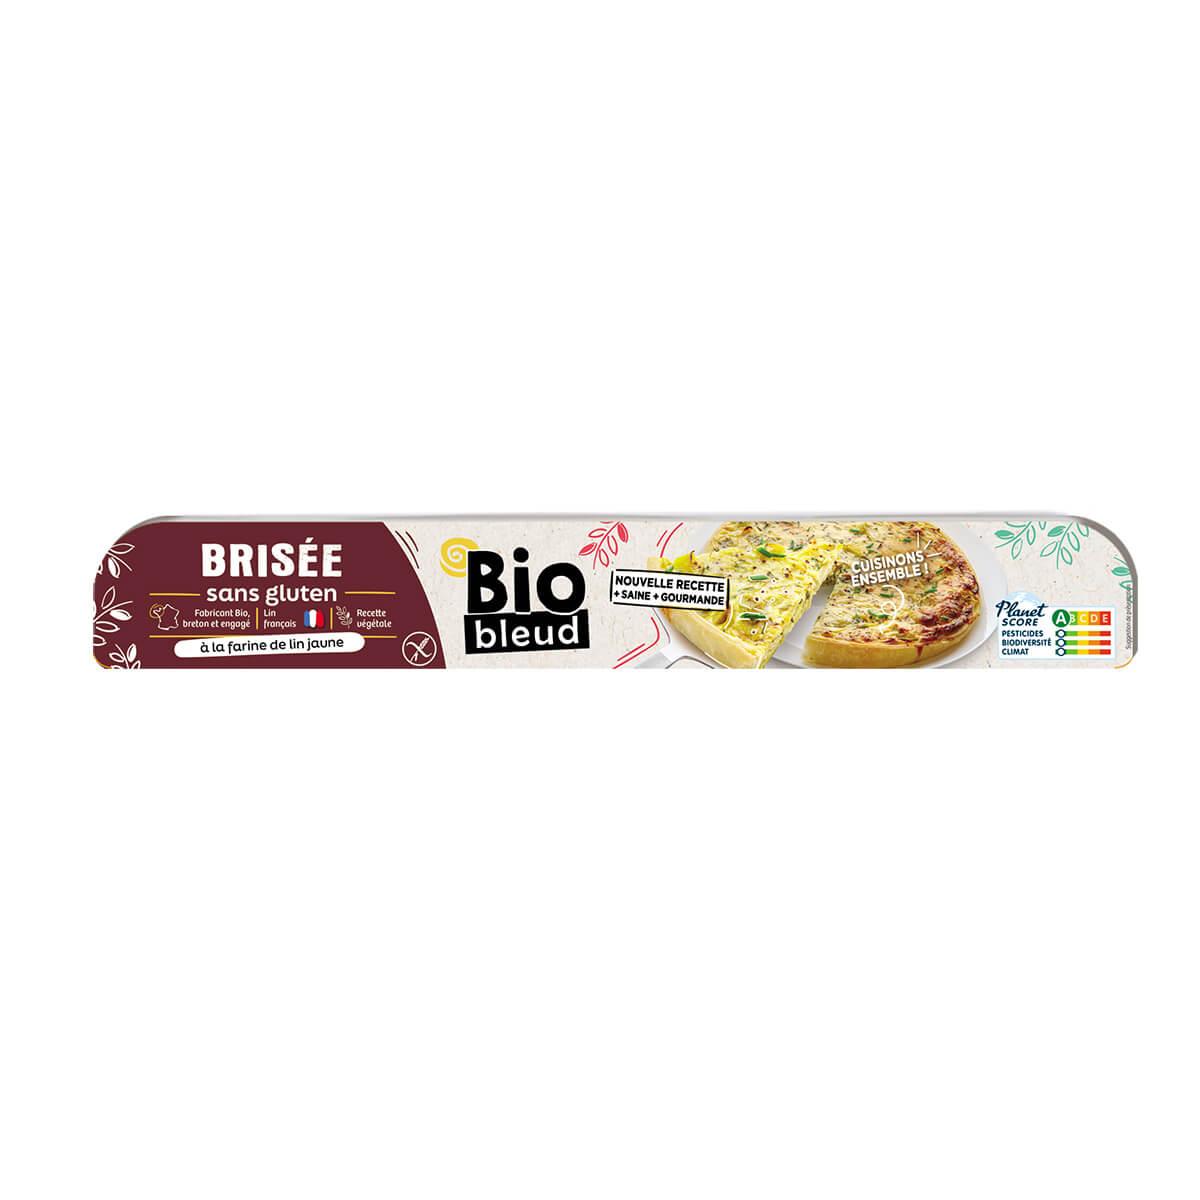 Biobleud - Pâte brisée sans gluten 260g